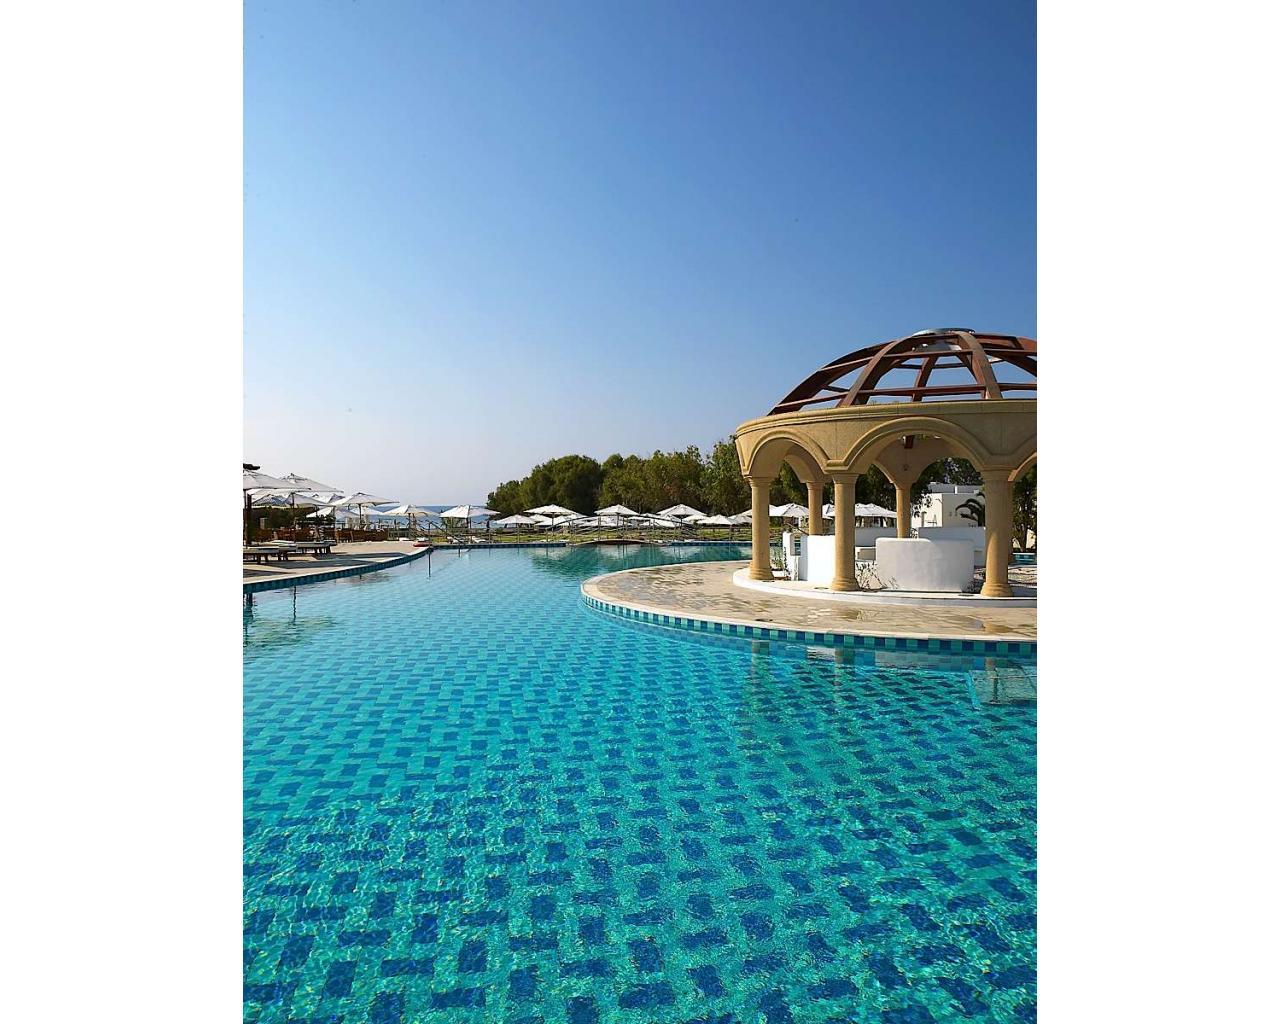 Waitress, Hostess at 5***** Resort in Rhodos Island Greece (students)